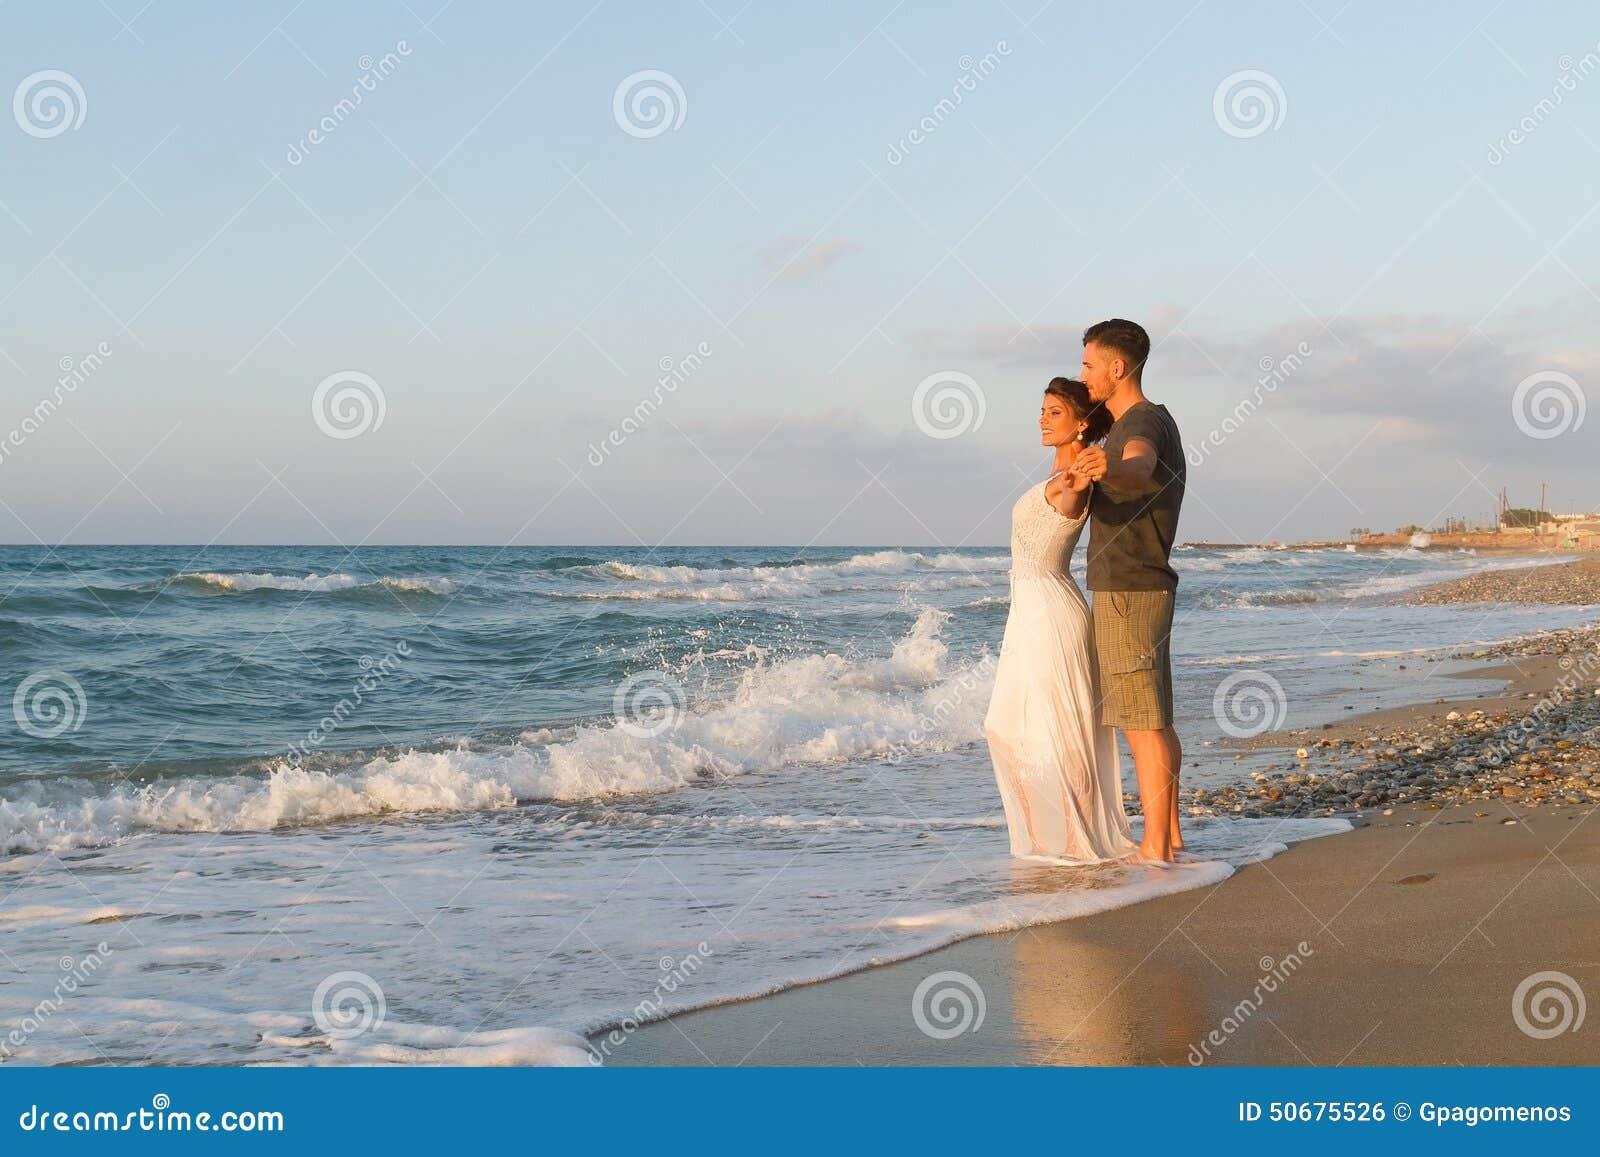 Download 年轻夫妇喜欢走在一个朦胧的海滩在 库存照片. 图片 包括有 关系, 黄昏, 心情, 夫妇, 休闲, 放松 - 50675526